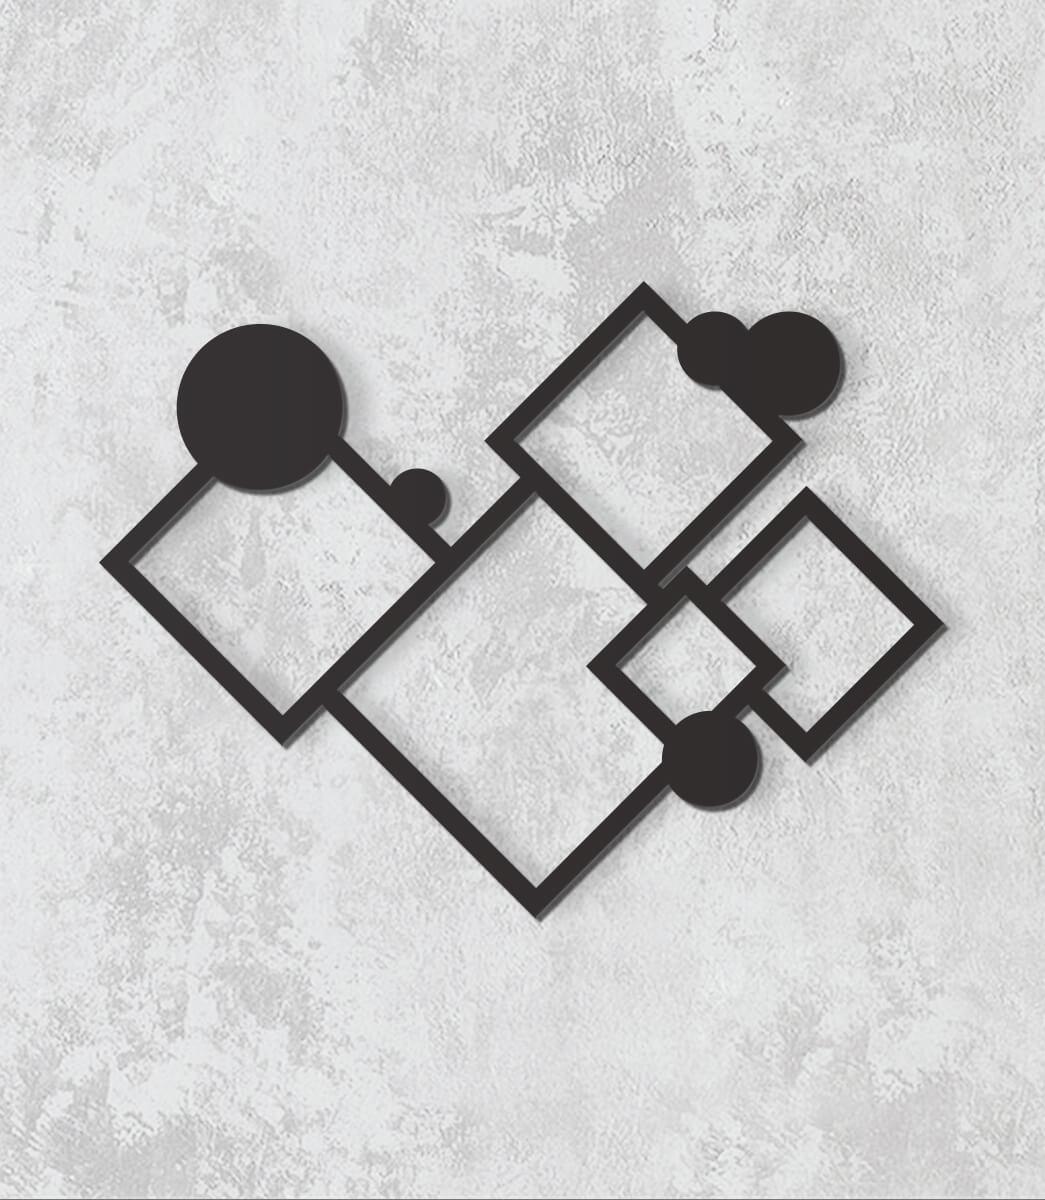 Decorativo 2D - Formas geométricas